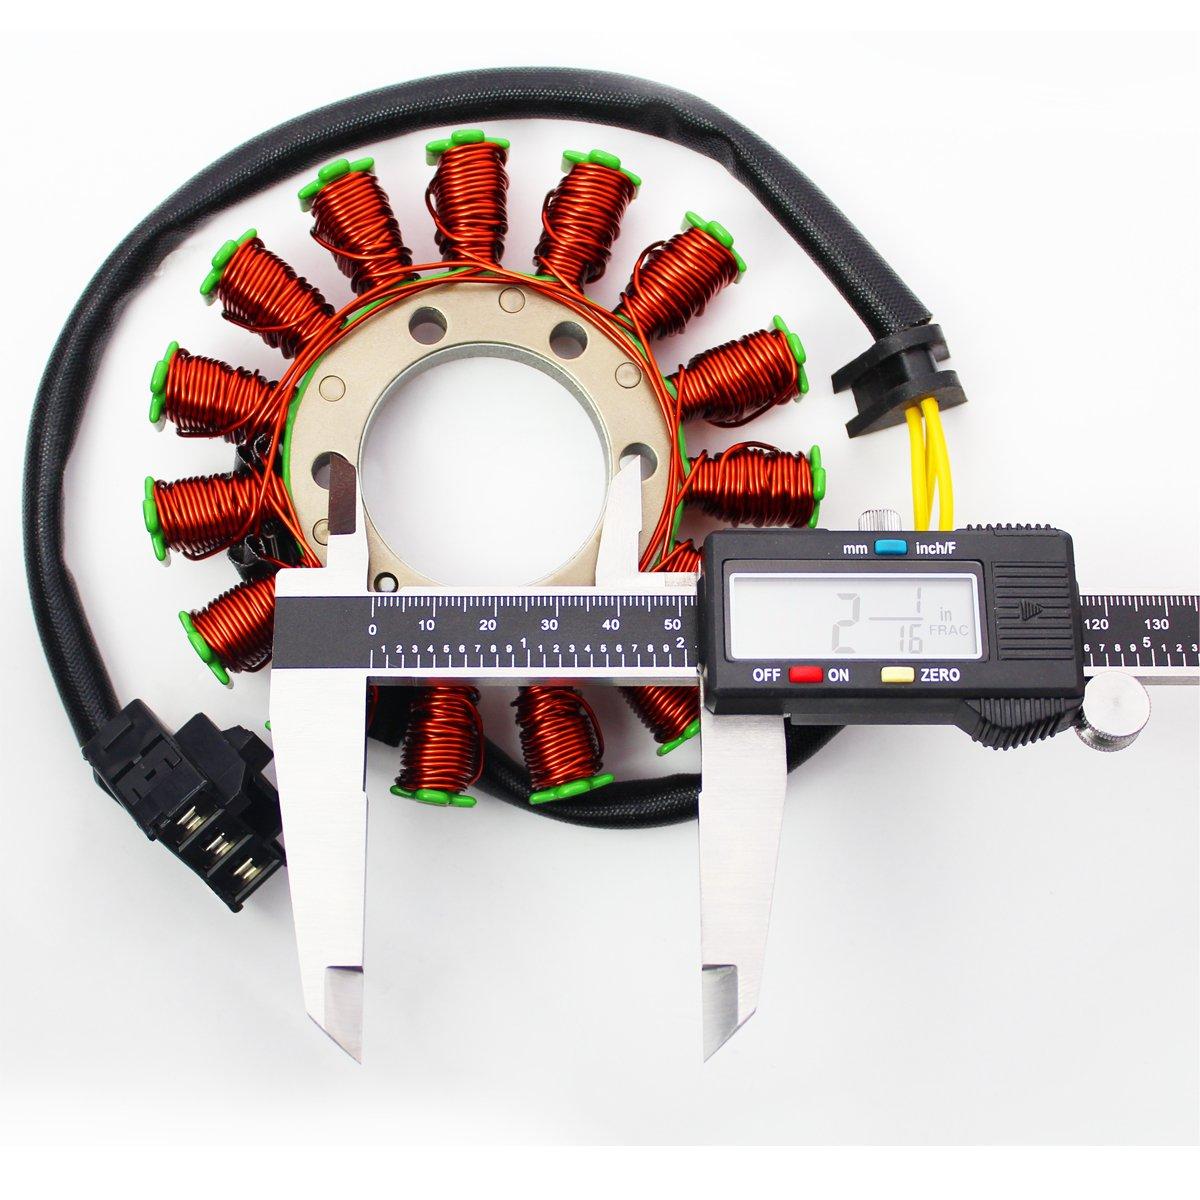 Emusa Oem Replacement Stator Magneto Coil Generator For Cbr Motorcycle Engine Shaft Diagram 07 12 Honda Cbr600rr Automotive